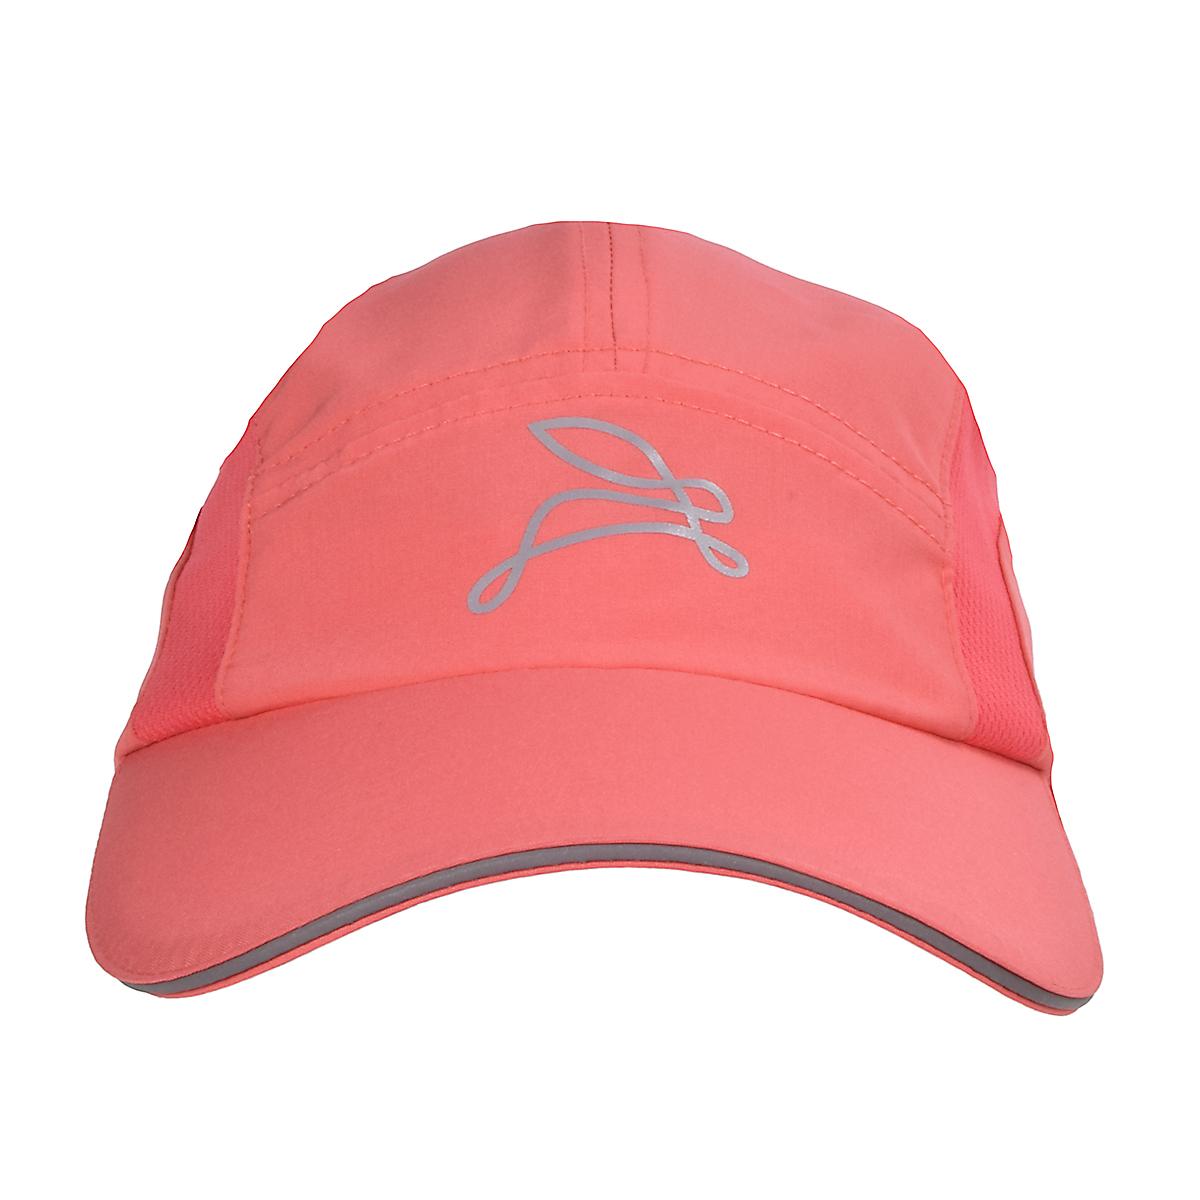 JackRabbit Run Hat - Color: Coral - Size: One Size, Coral, large, image 2